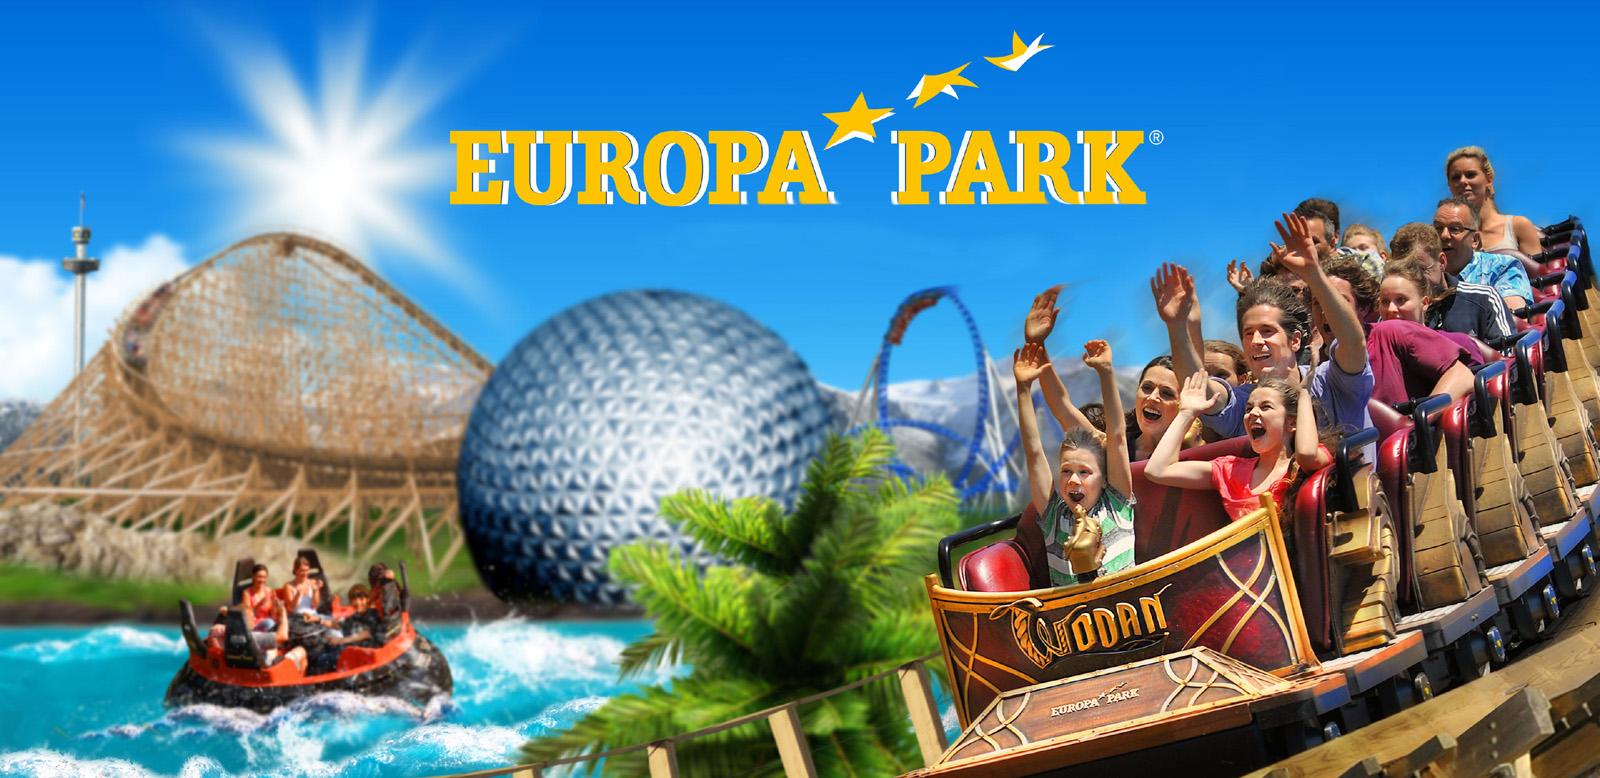 europapark-en-car-neuchatel